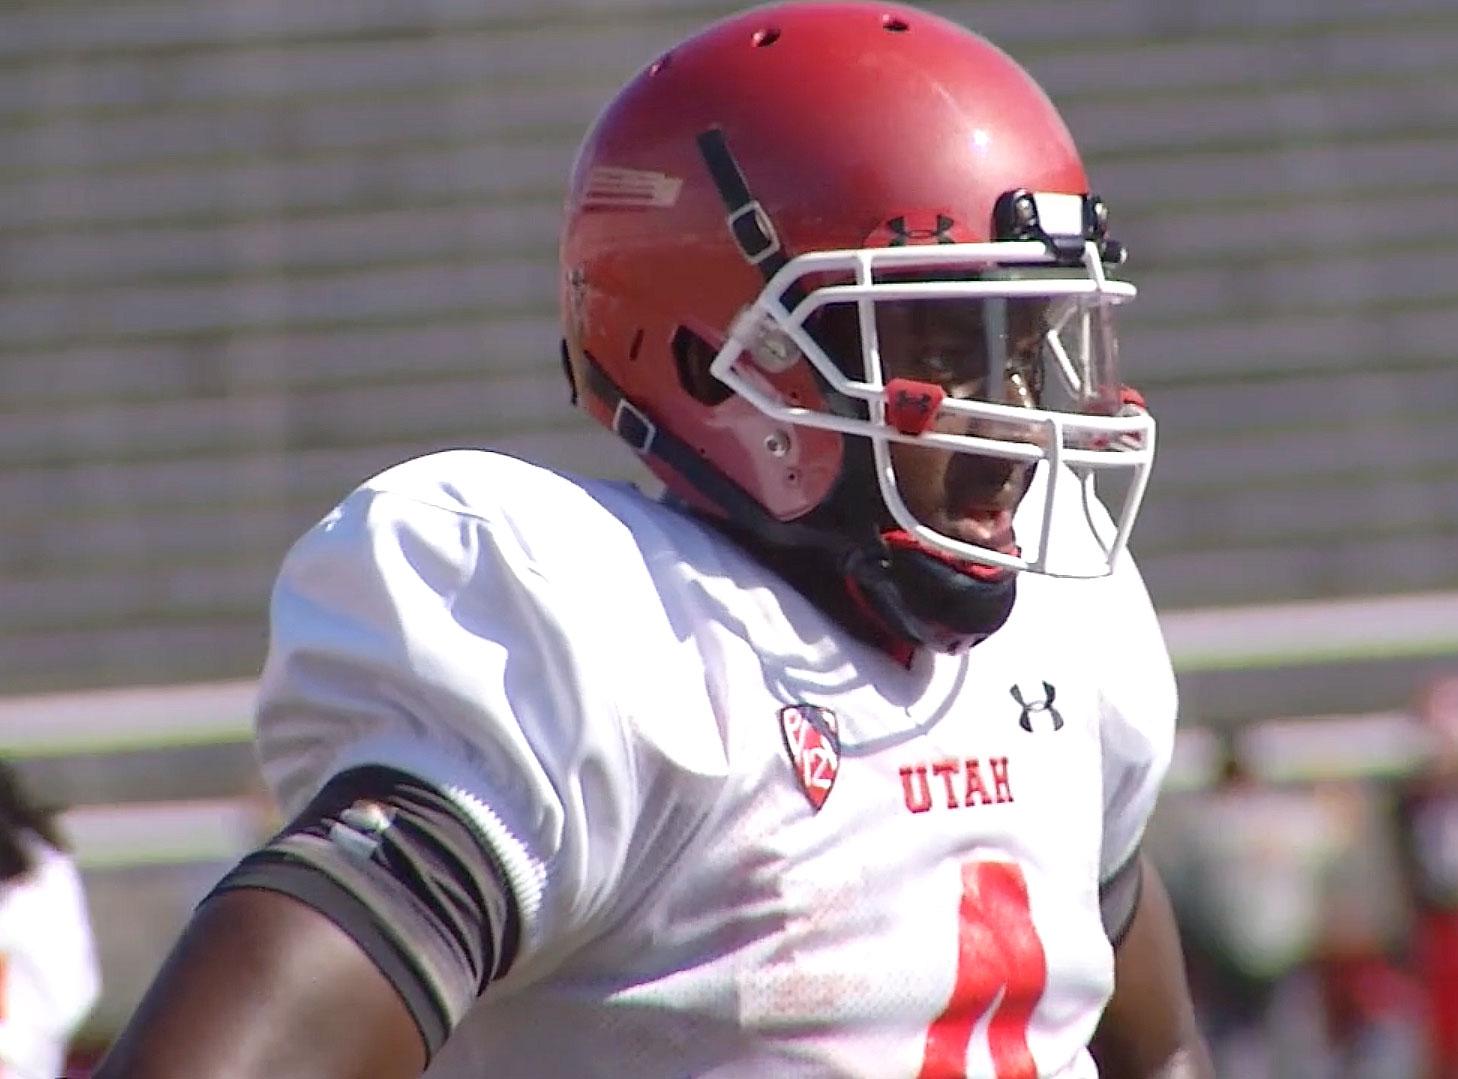 Freshman Donovan Isom has added to Utah's depth and talent at quarterback.